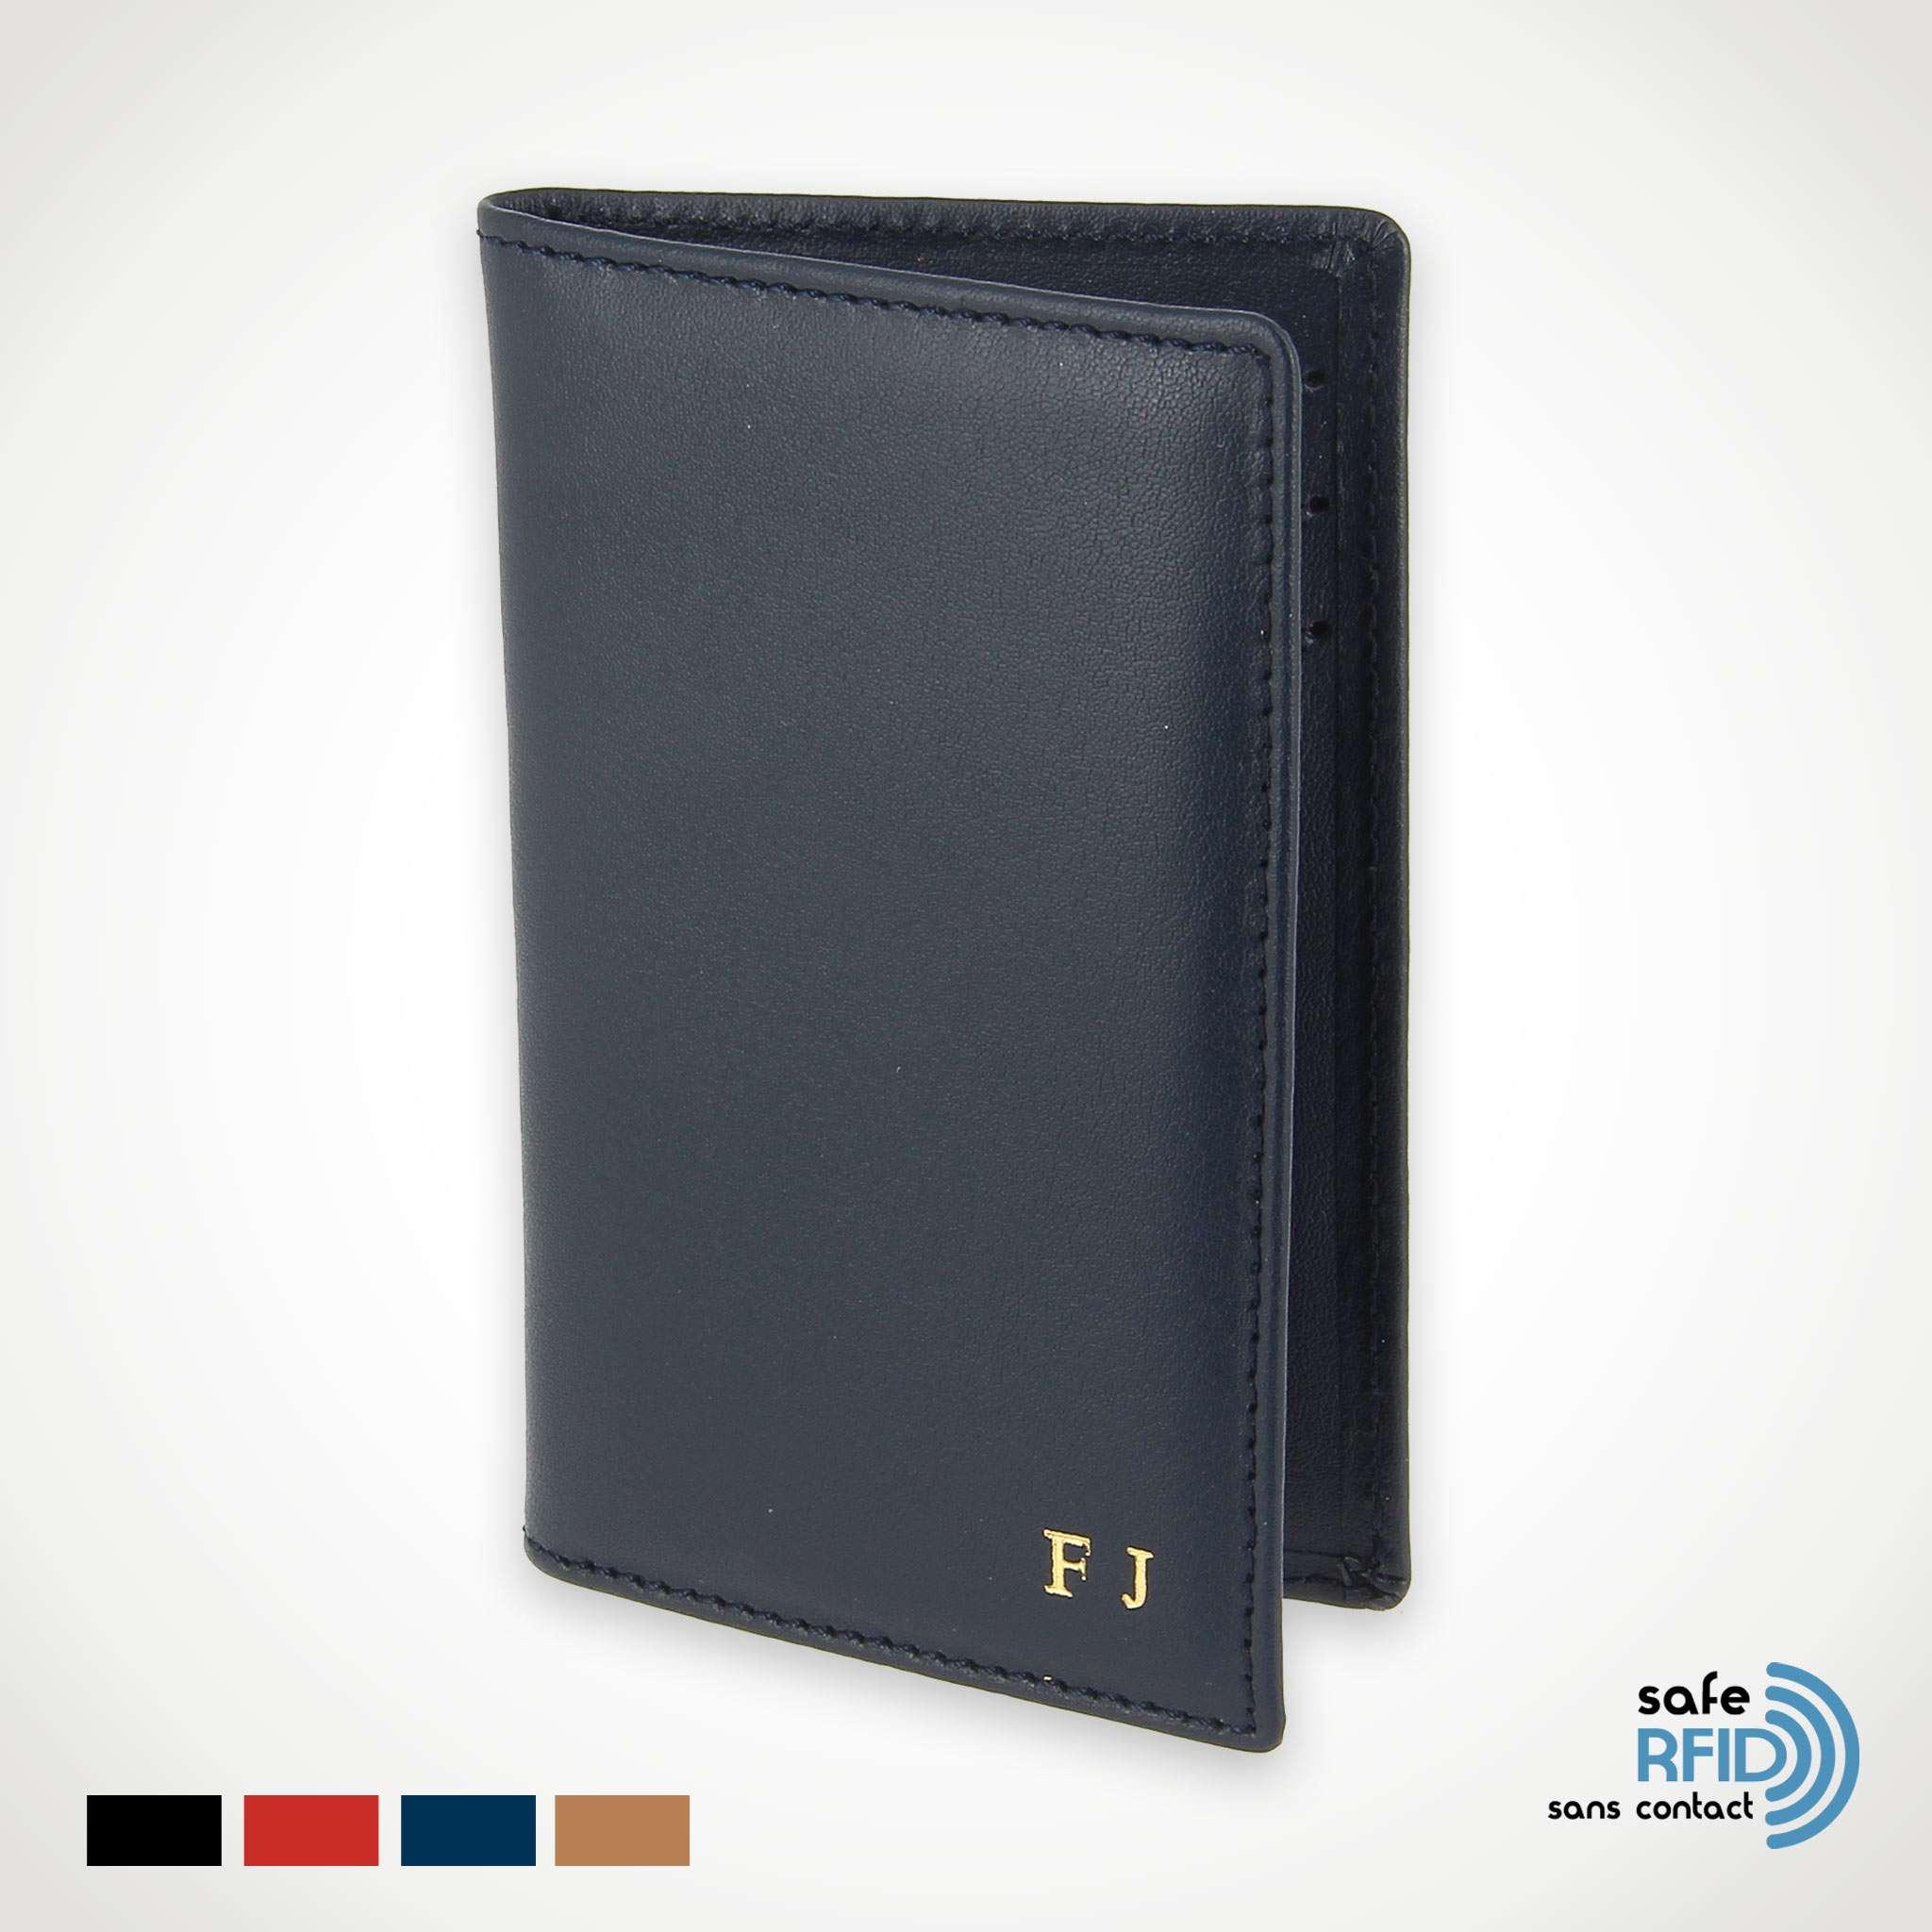 tui anti rfid cuir 6 cartes protection carte paiement sans contact. Black Bedroom Furniture Sets. Home Design Ideas